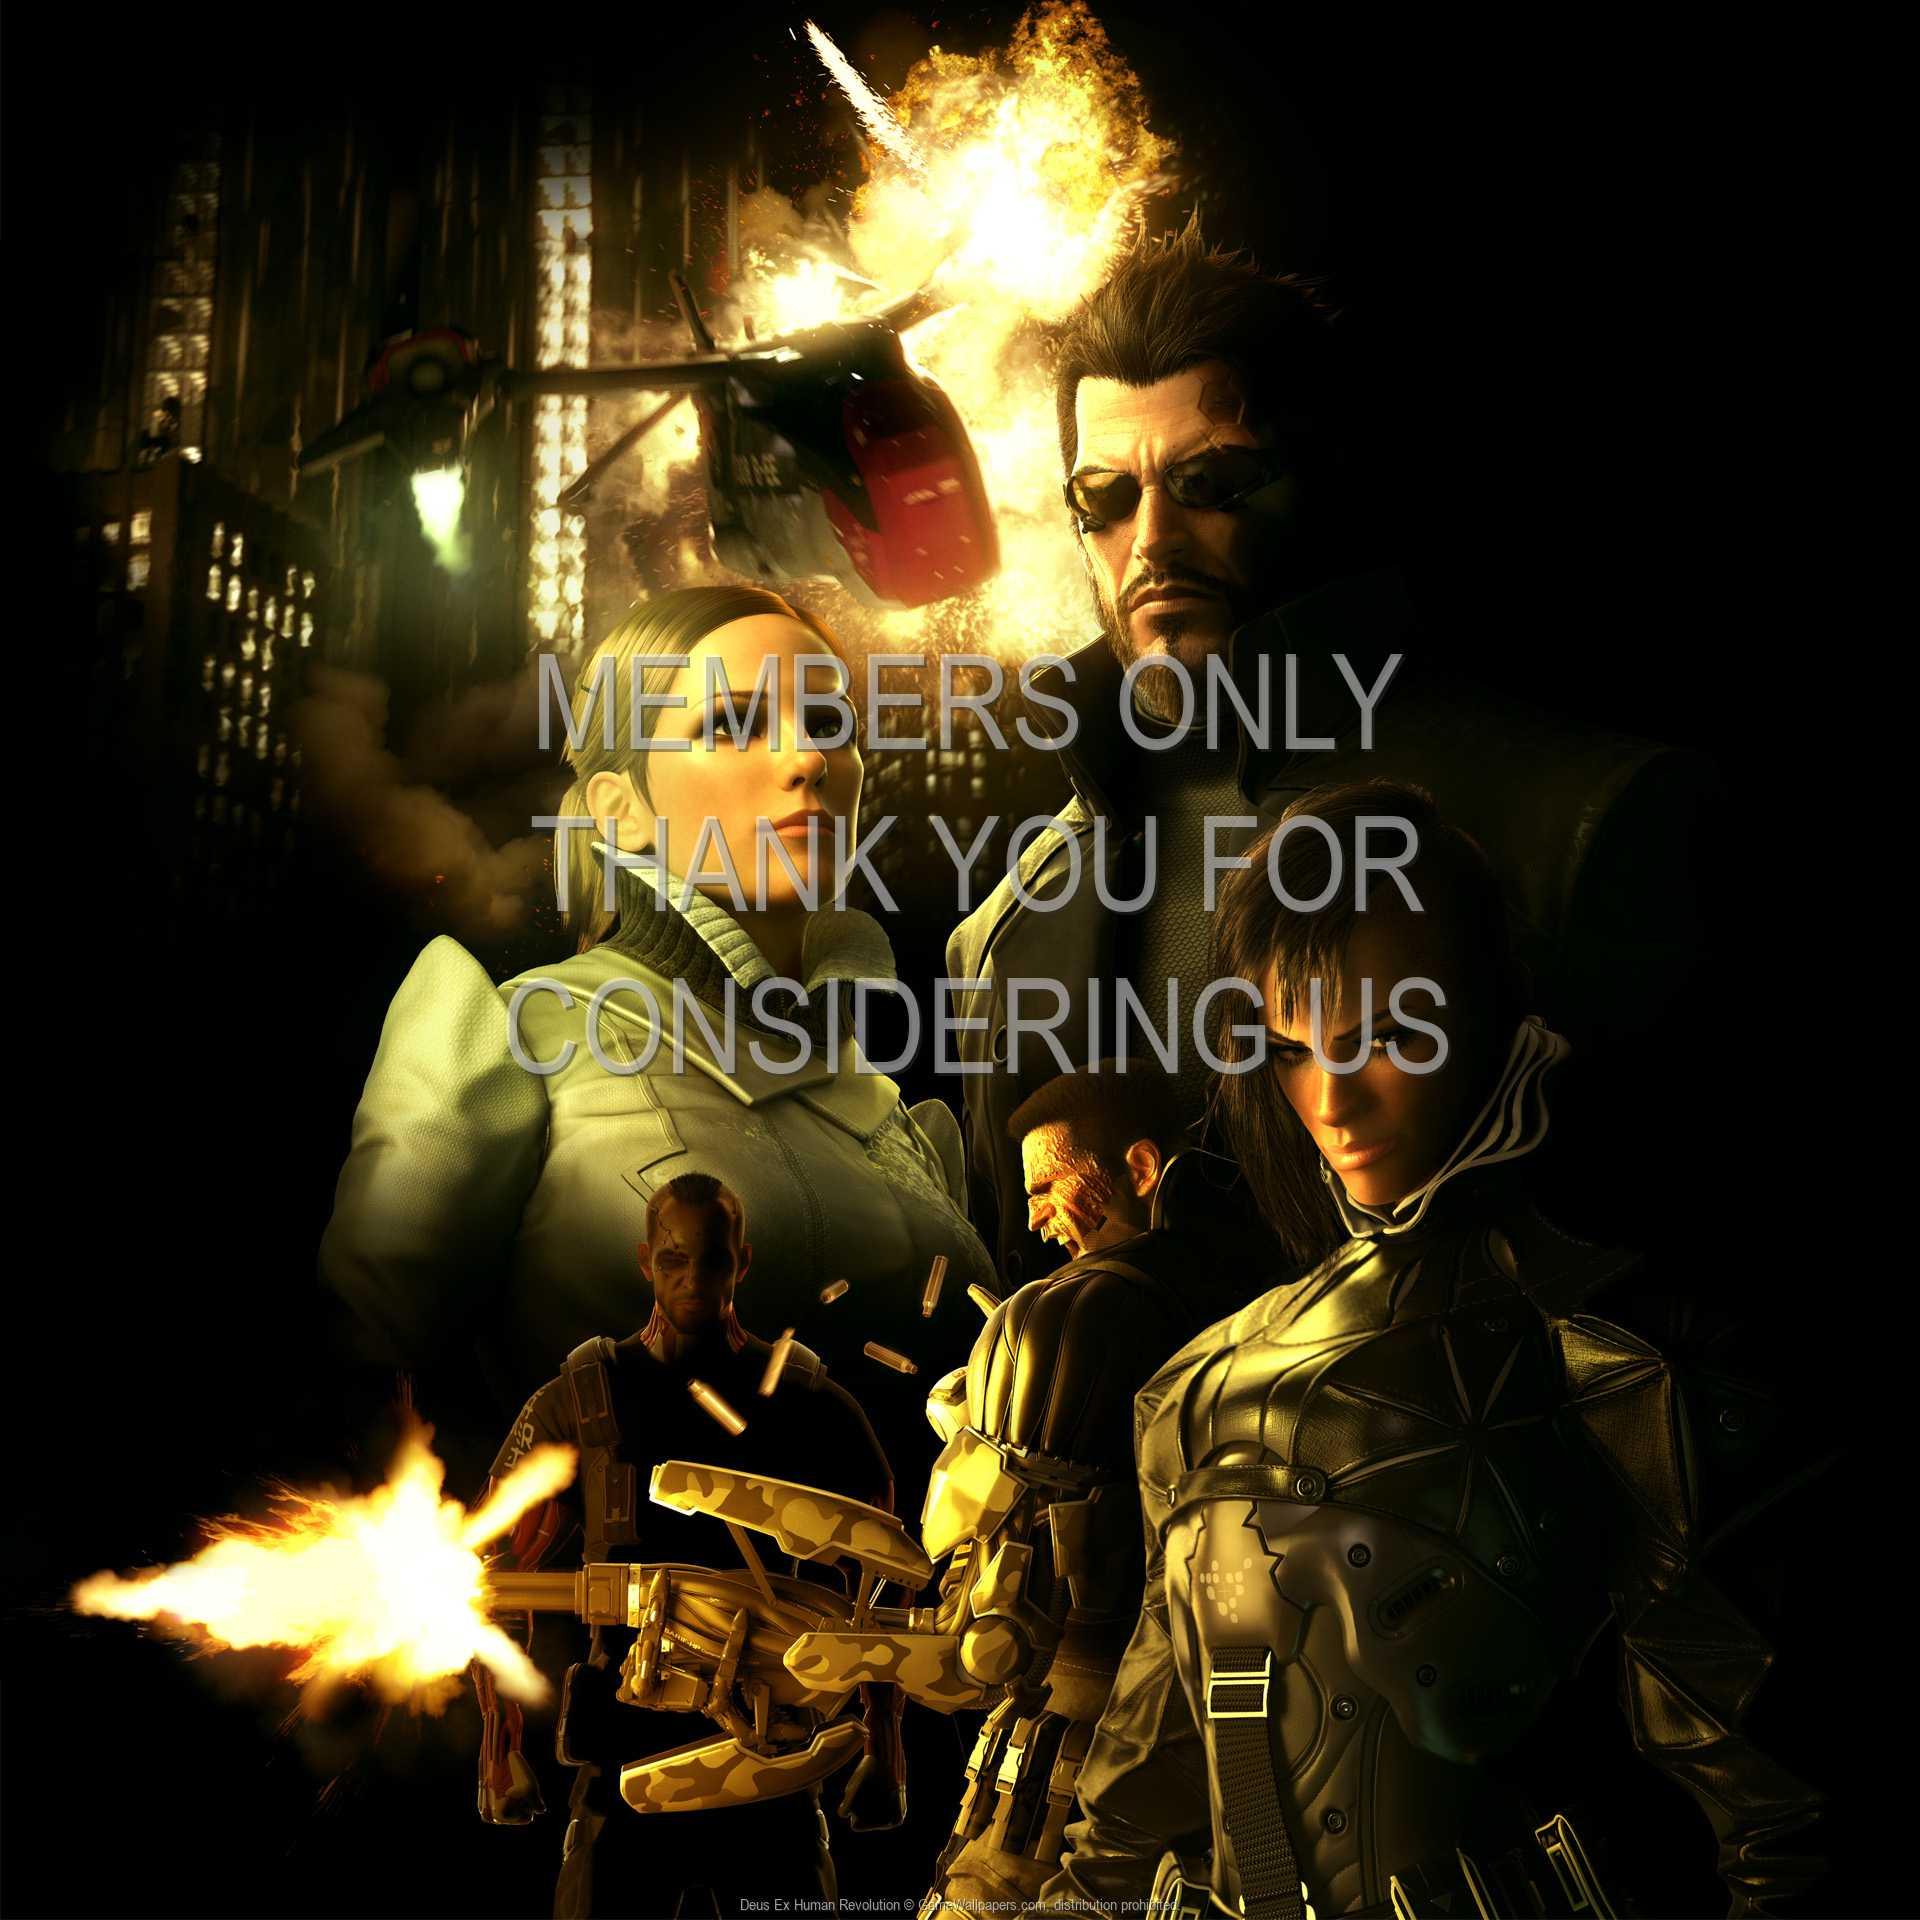 Deus Ex: Human Revolution 1080p Horizontal Handy Hintergrundbild 16